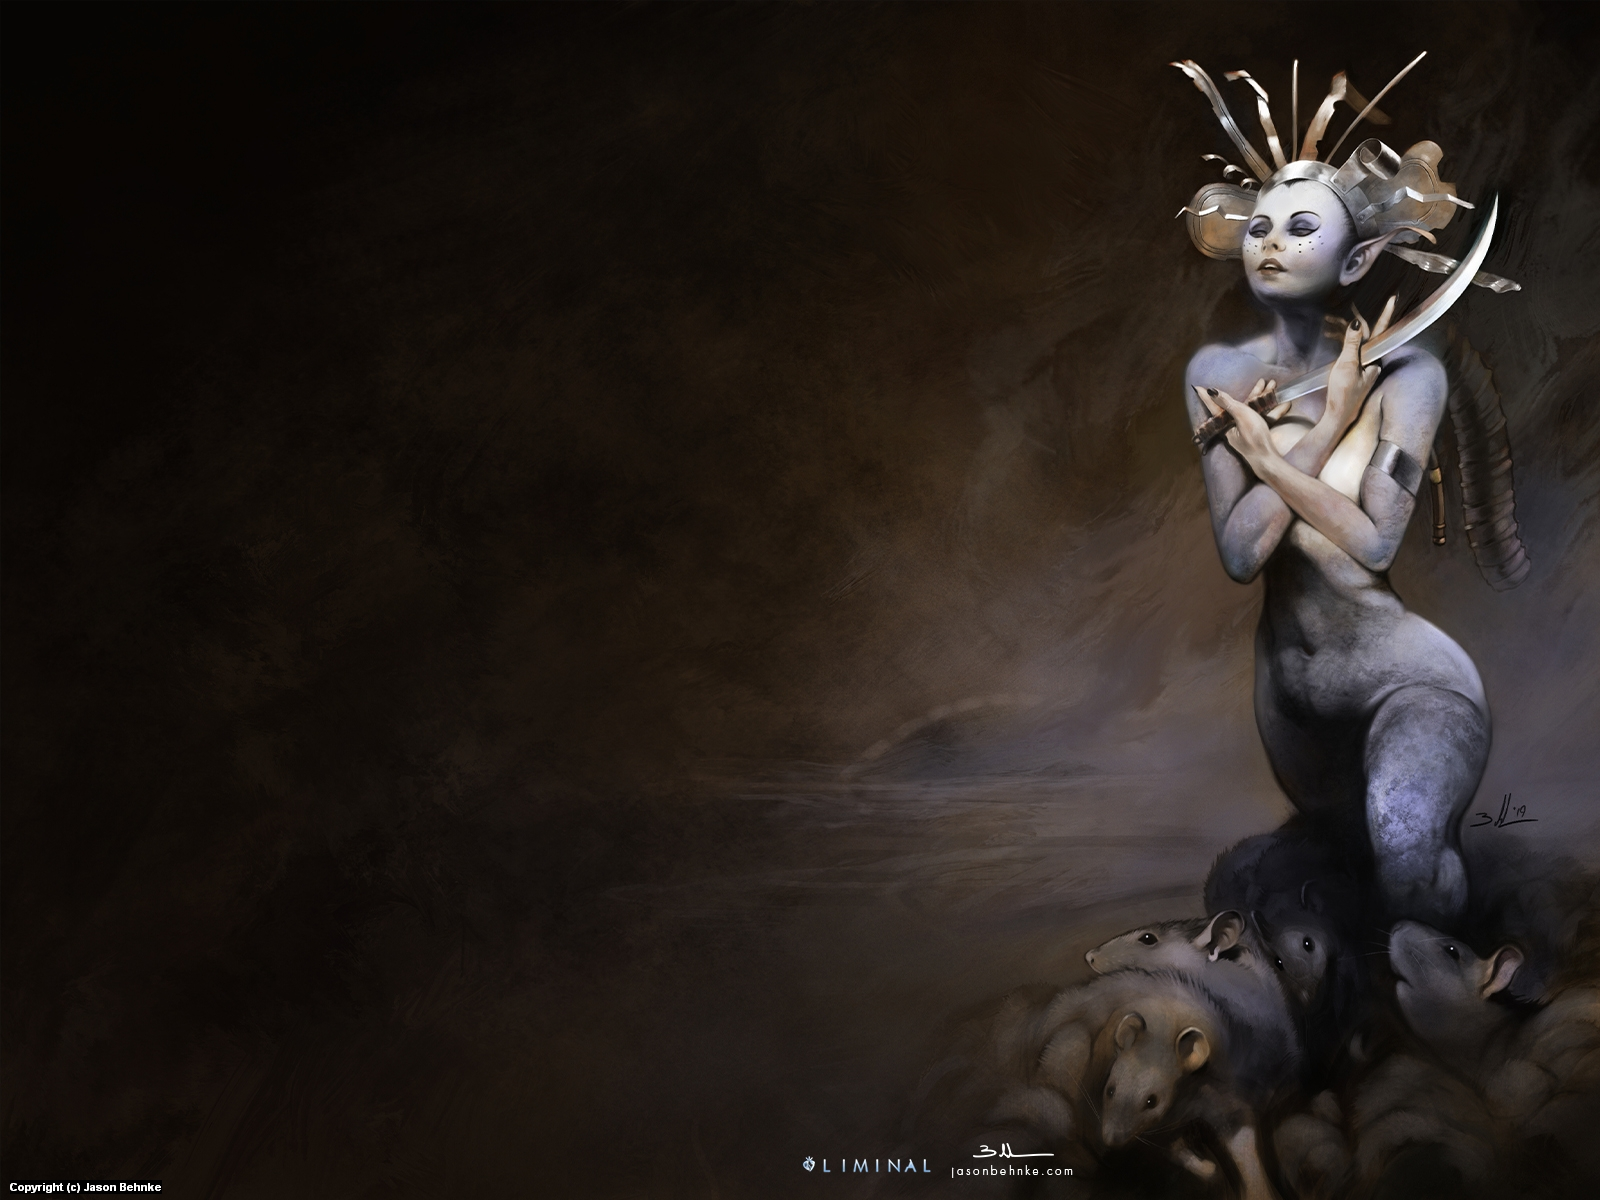 The Rat Queen Artwork by Jason Behnke